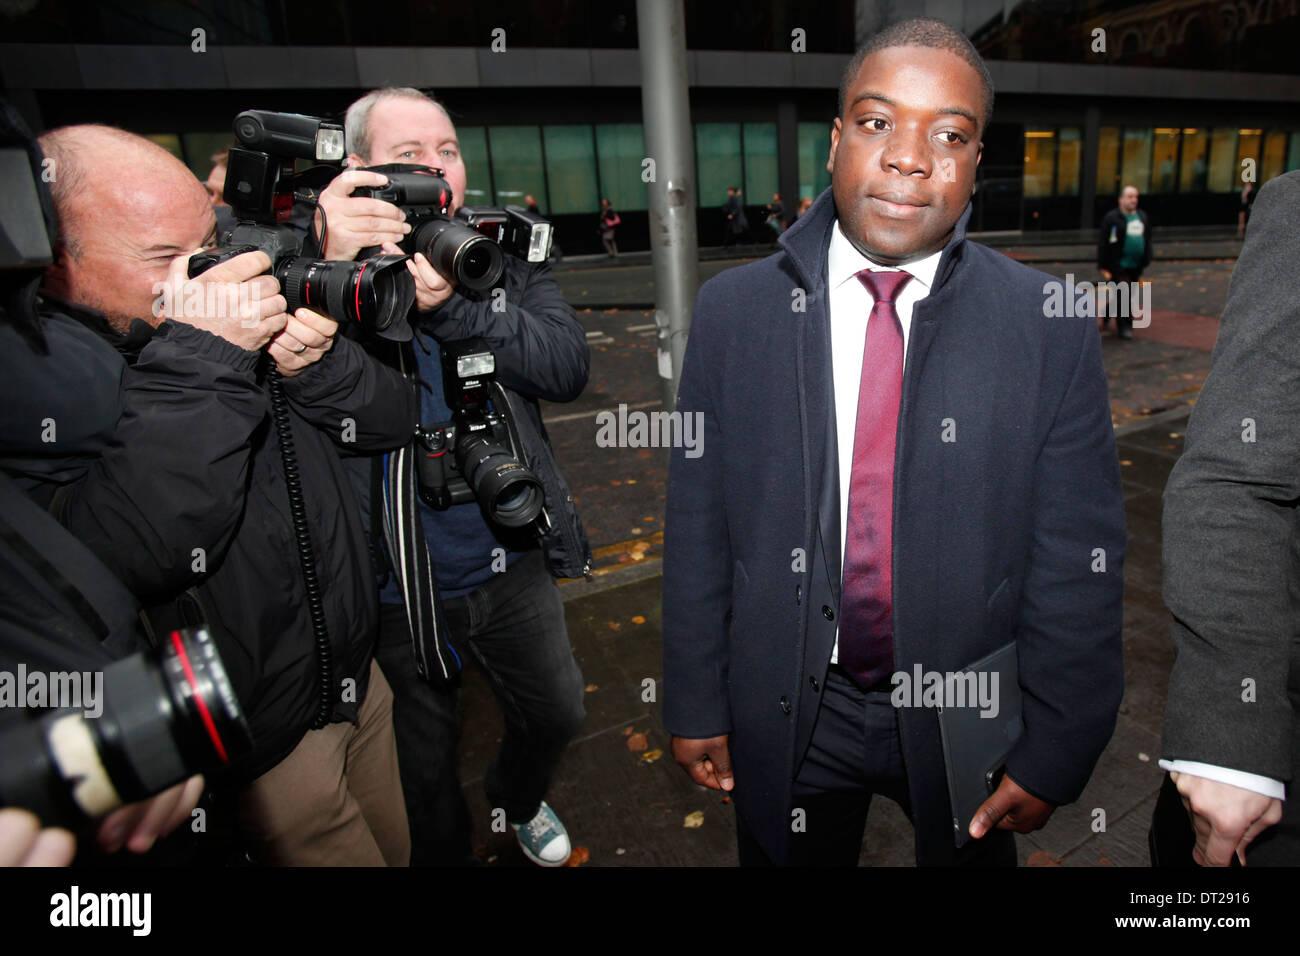 risk controls at UBS: the case of trader Kweku Adoboli ...